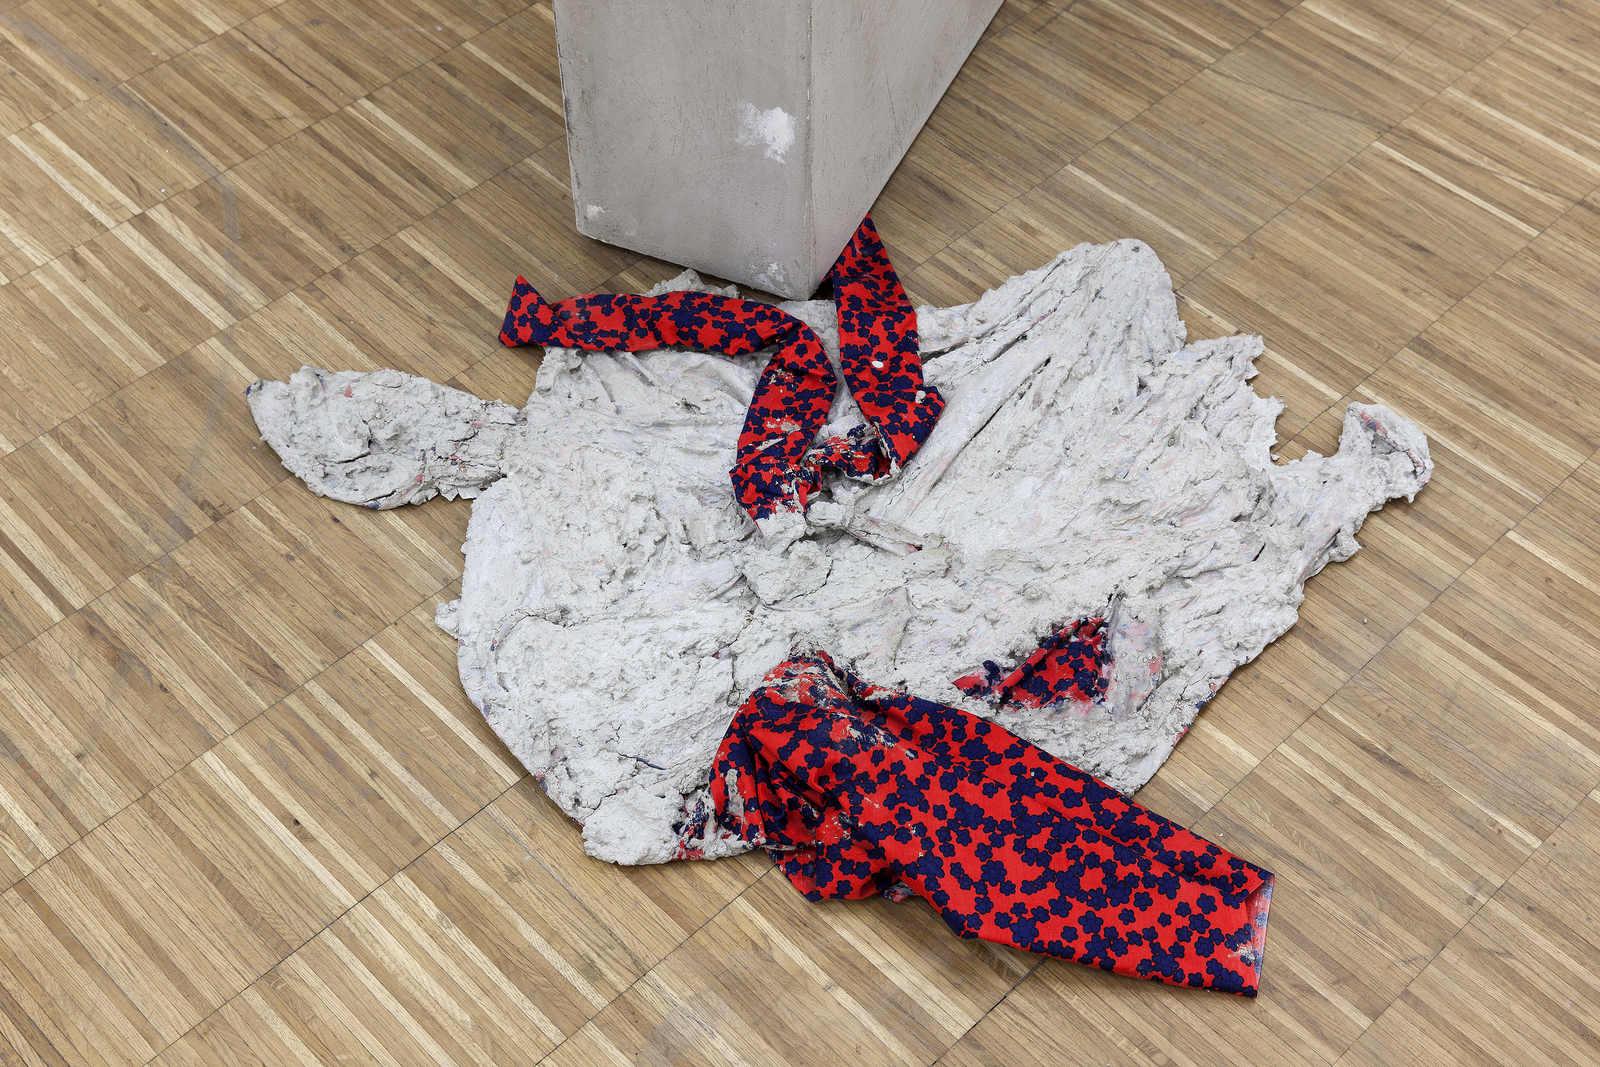 33_Concrete_Coat_(Kimono)_anna-Sophie_berger